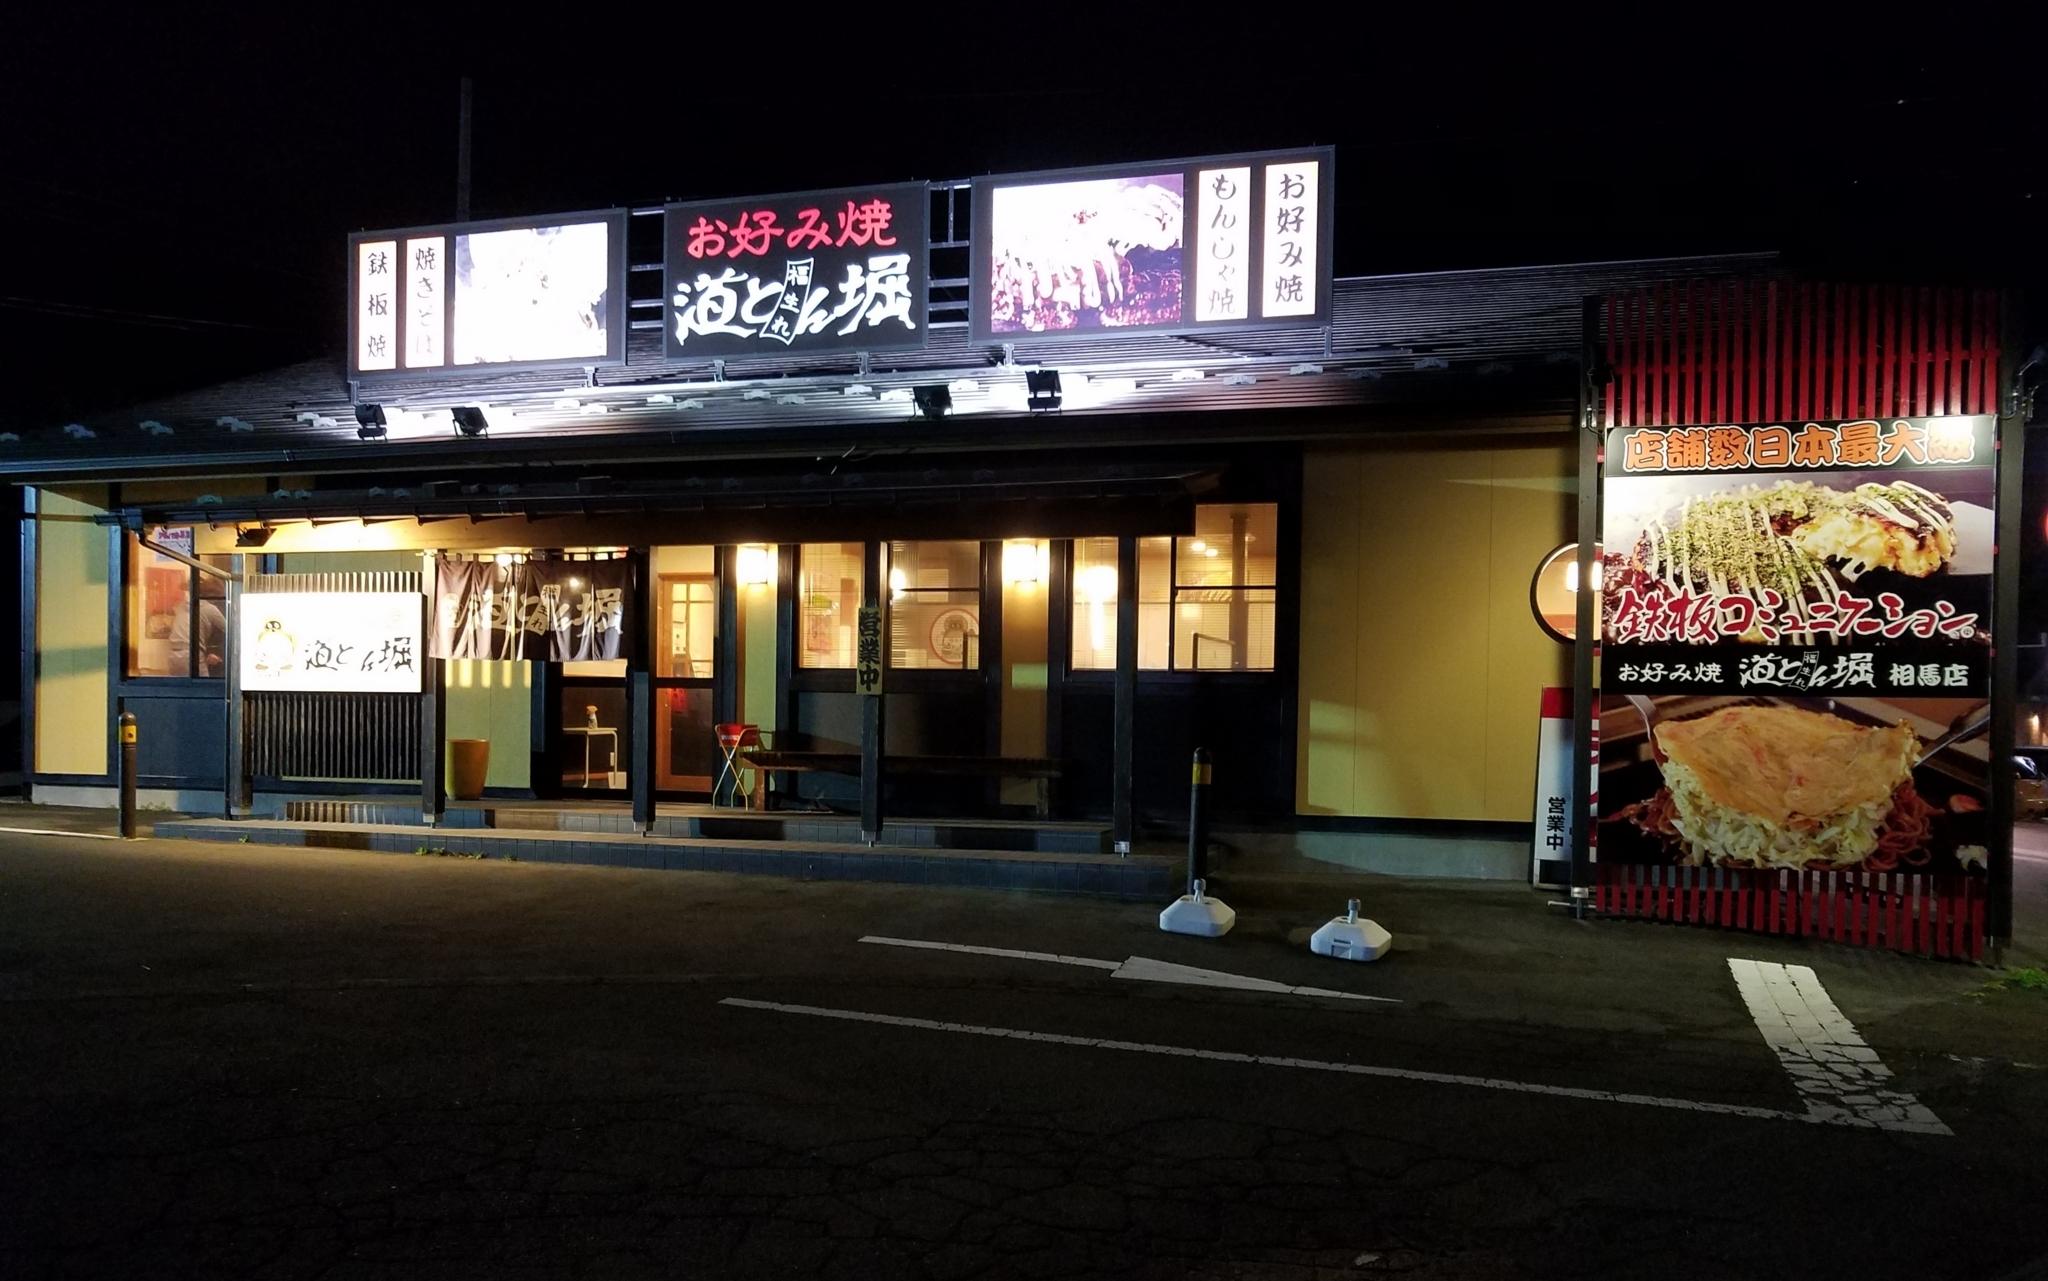 f:id:ToshUeno:20171123183700j:plain